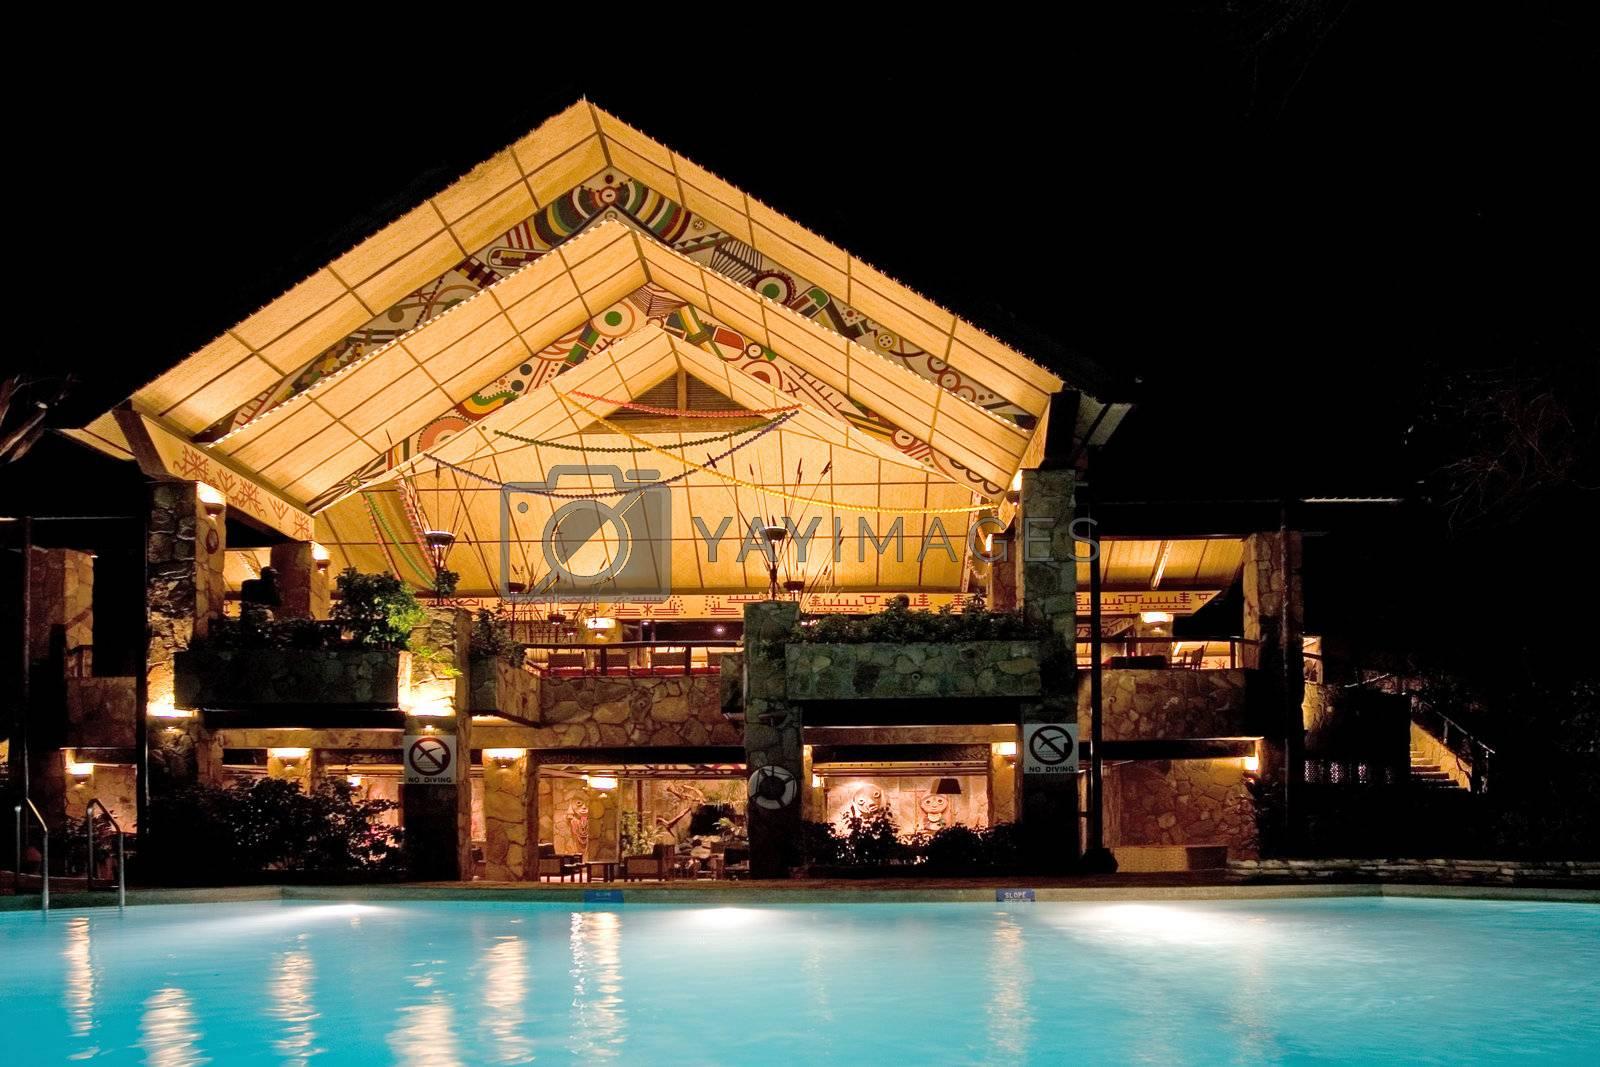 African Lodge Night Shot